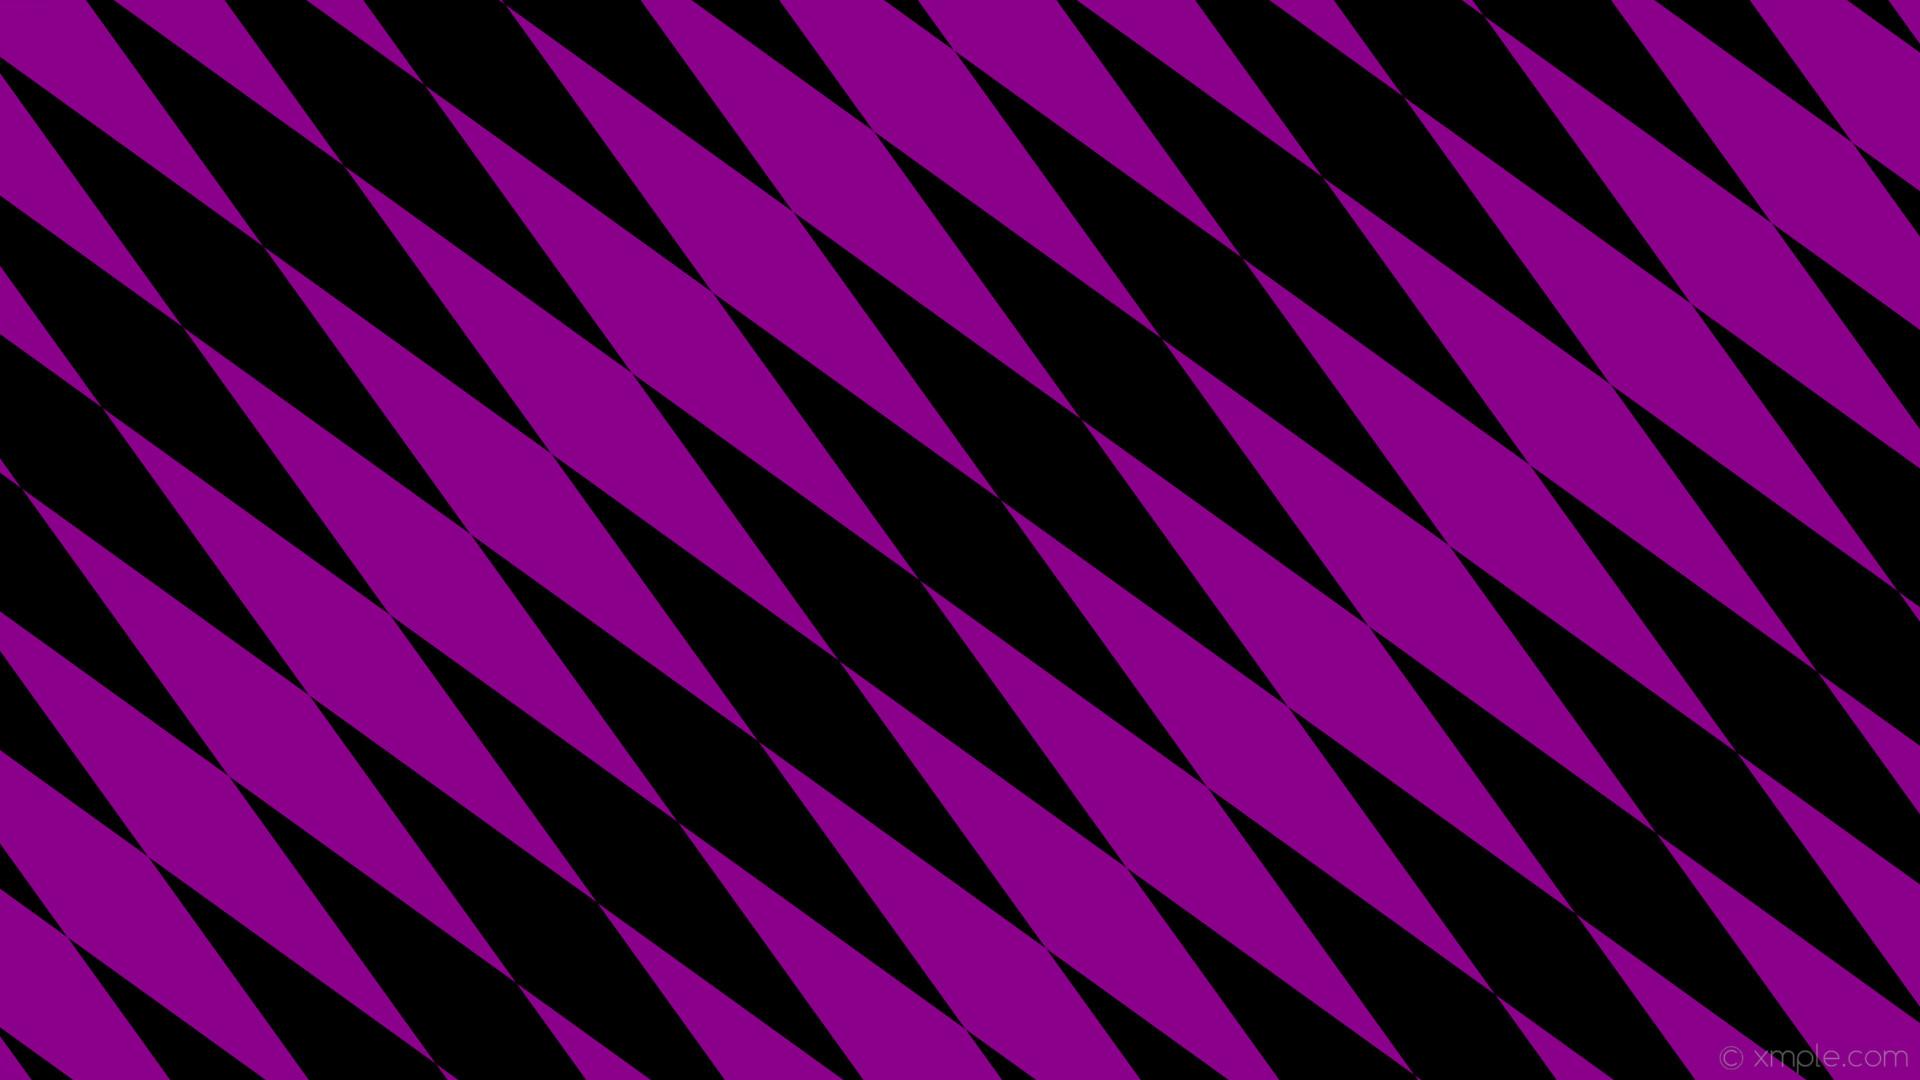 wallpaper lozenge black purple diamond rhombus dark magenta #000000 #8b008b  135° 700px 114px